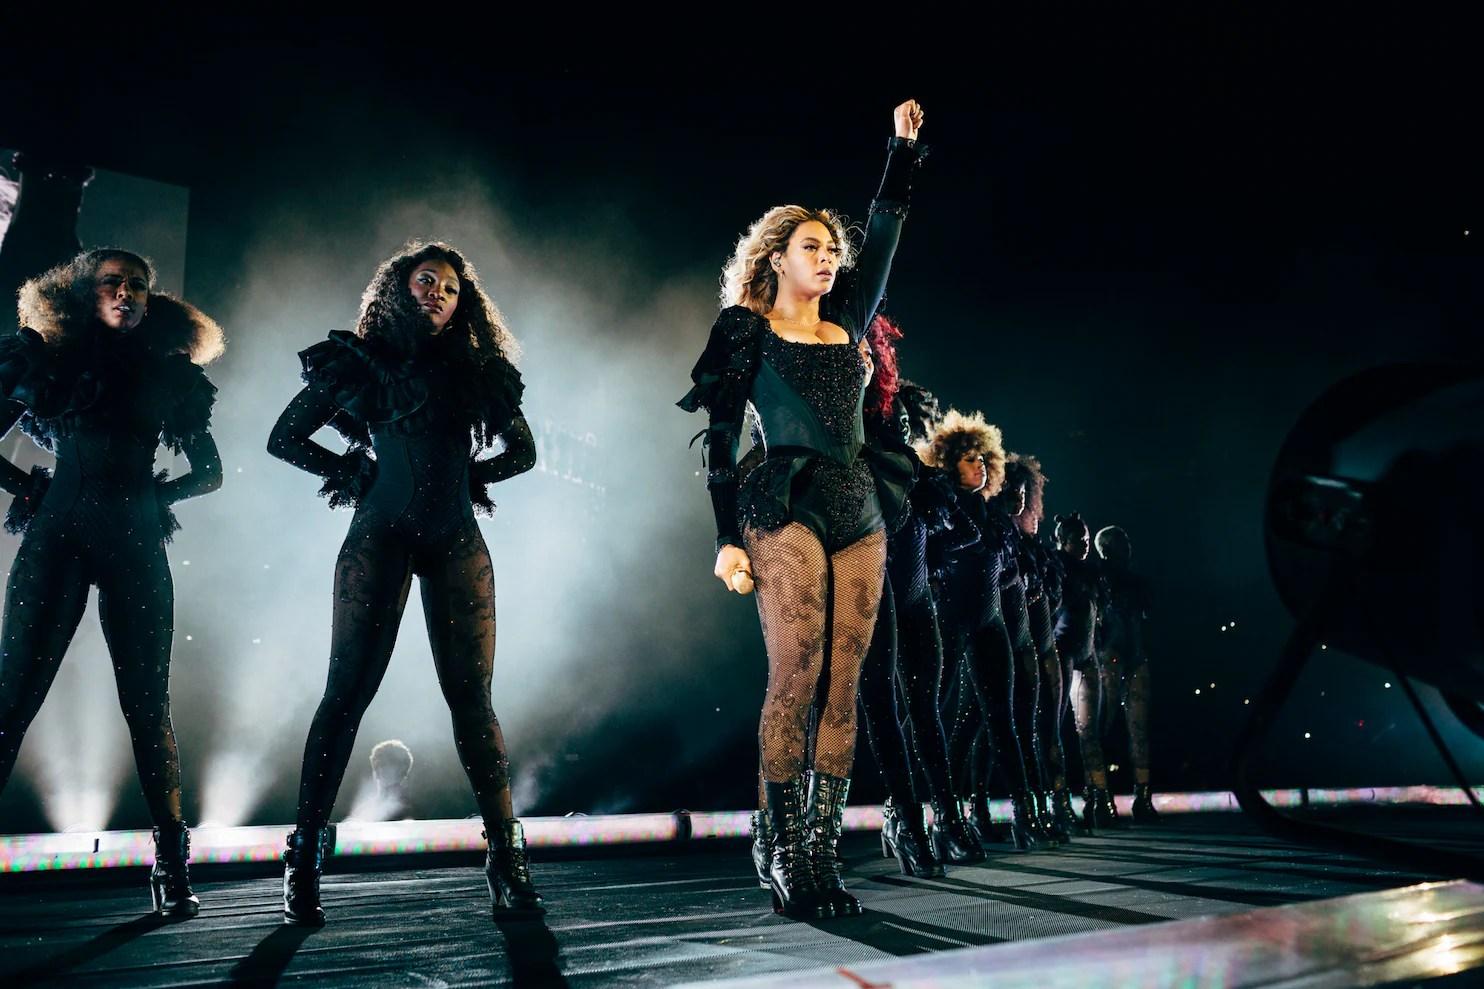 Single Hd Wallpaper Beyonc 233 S Formation World Tour Empowerment You Can Dance